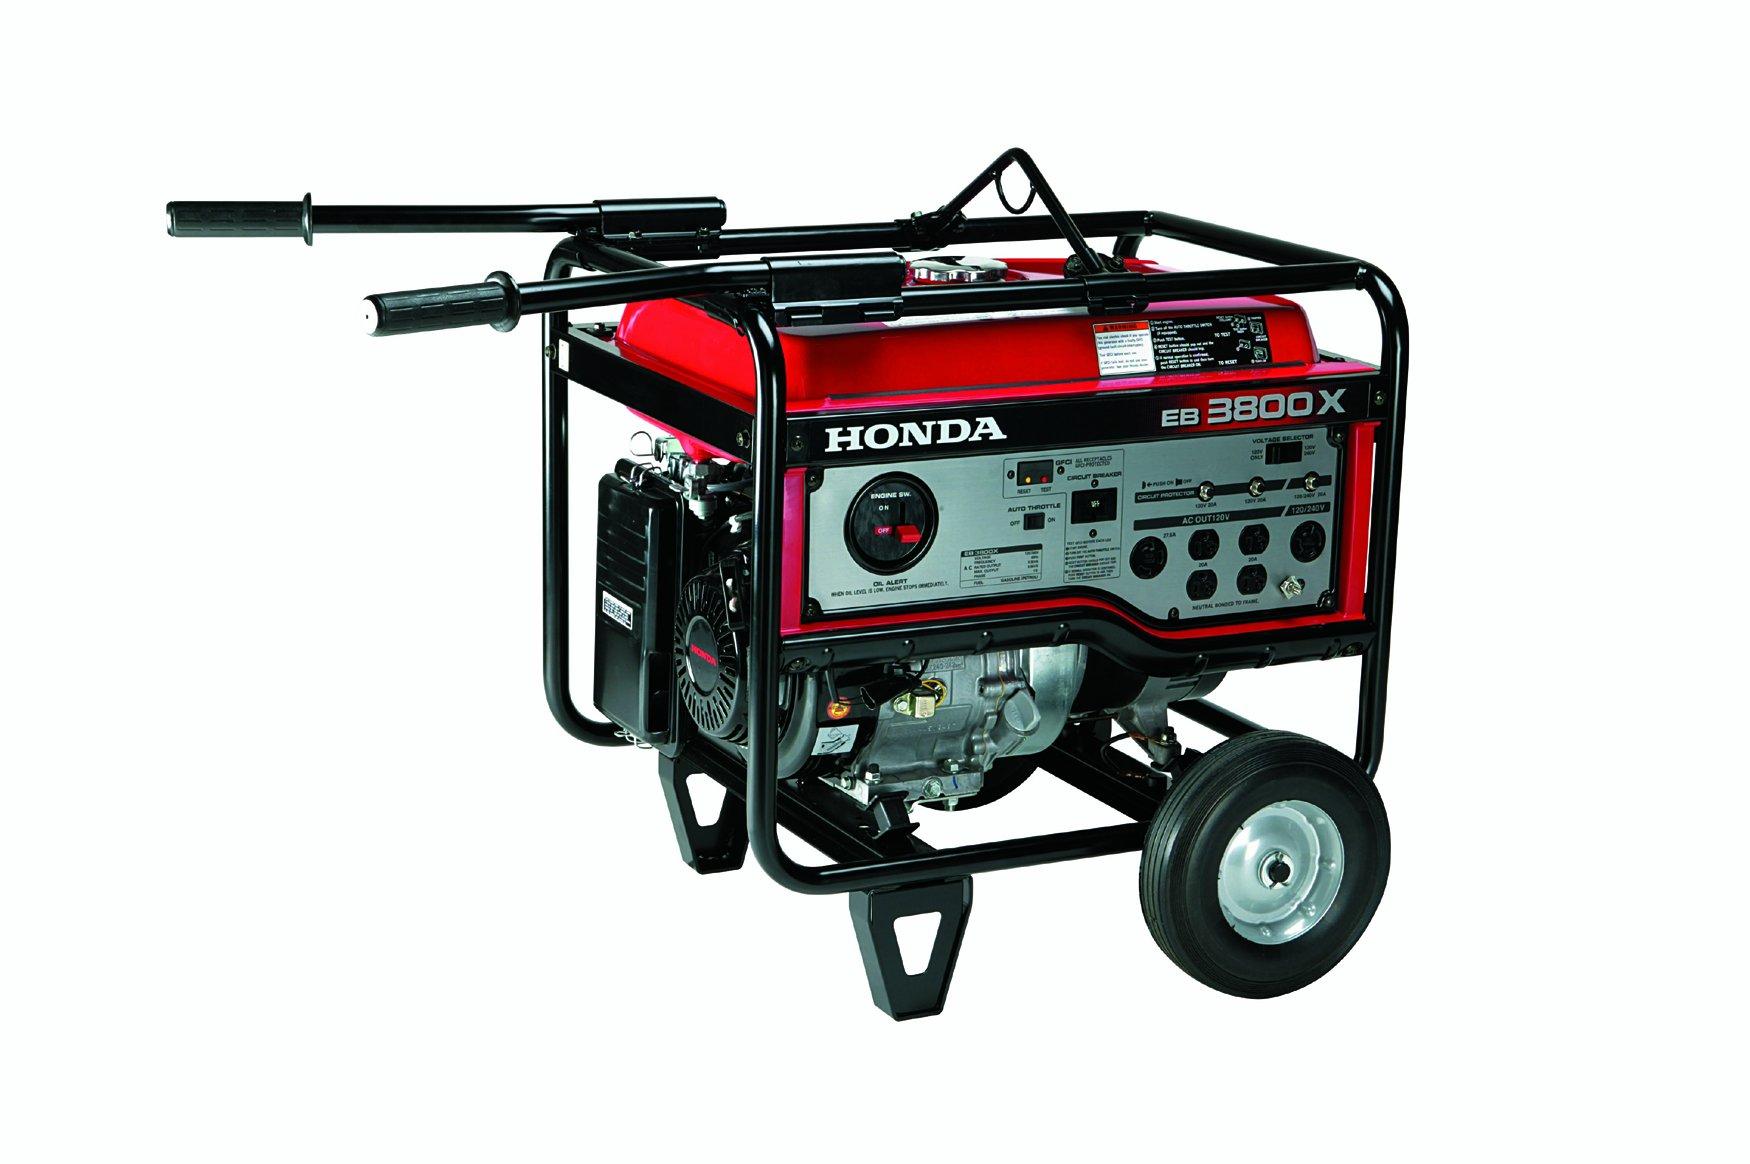 generator wiring diagram for honda gx 120    honda    gx160    generator       wiring       diagram       wiring       diagram        honda    gx160    generator       wiring       diagram       wiring       diagram